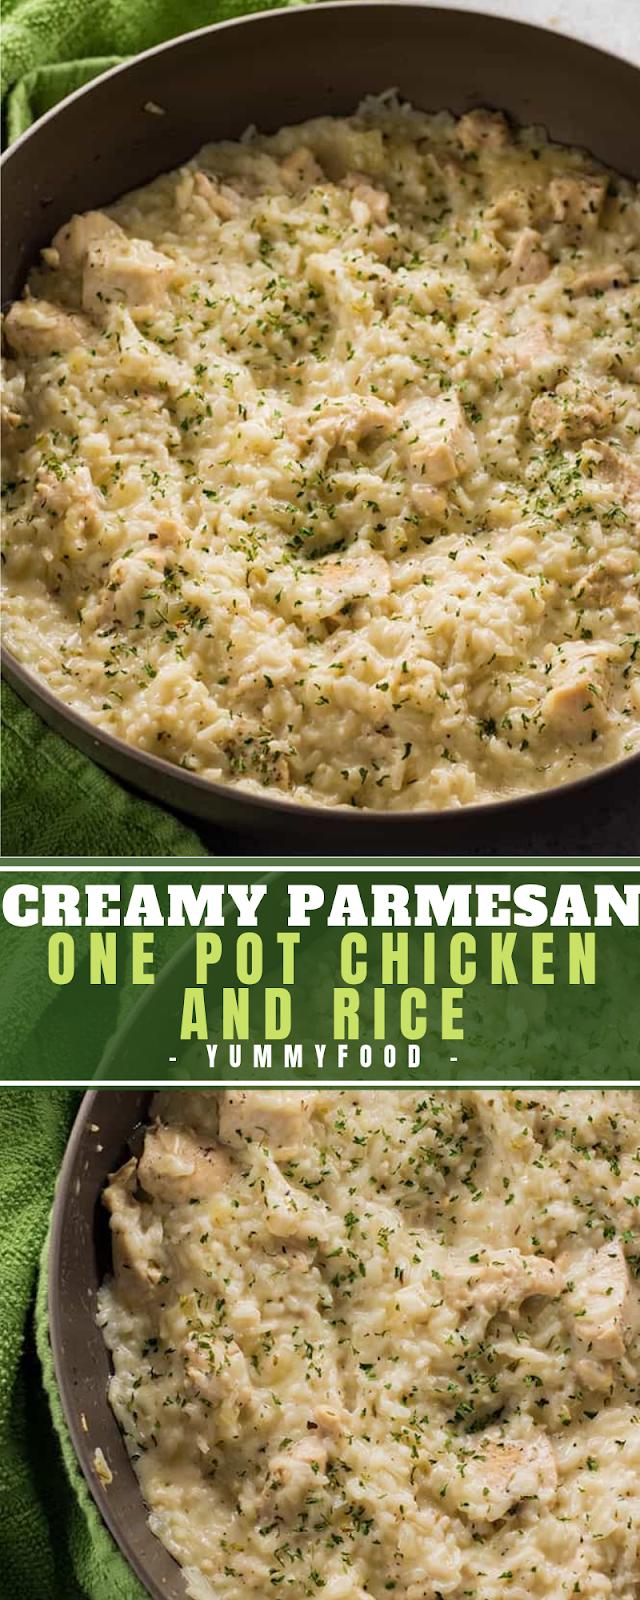 Creamy Parmesan One Pоt Chісkеn аnd Rice